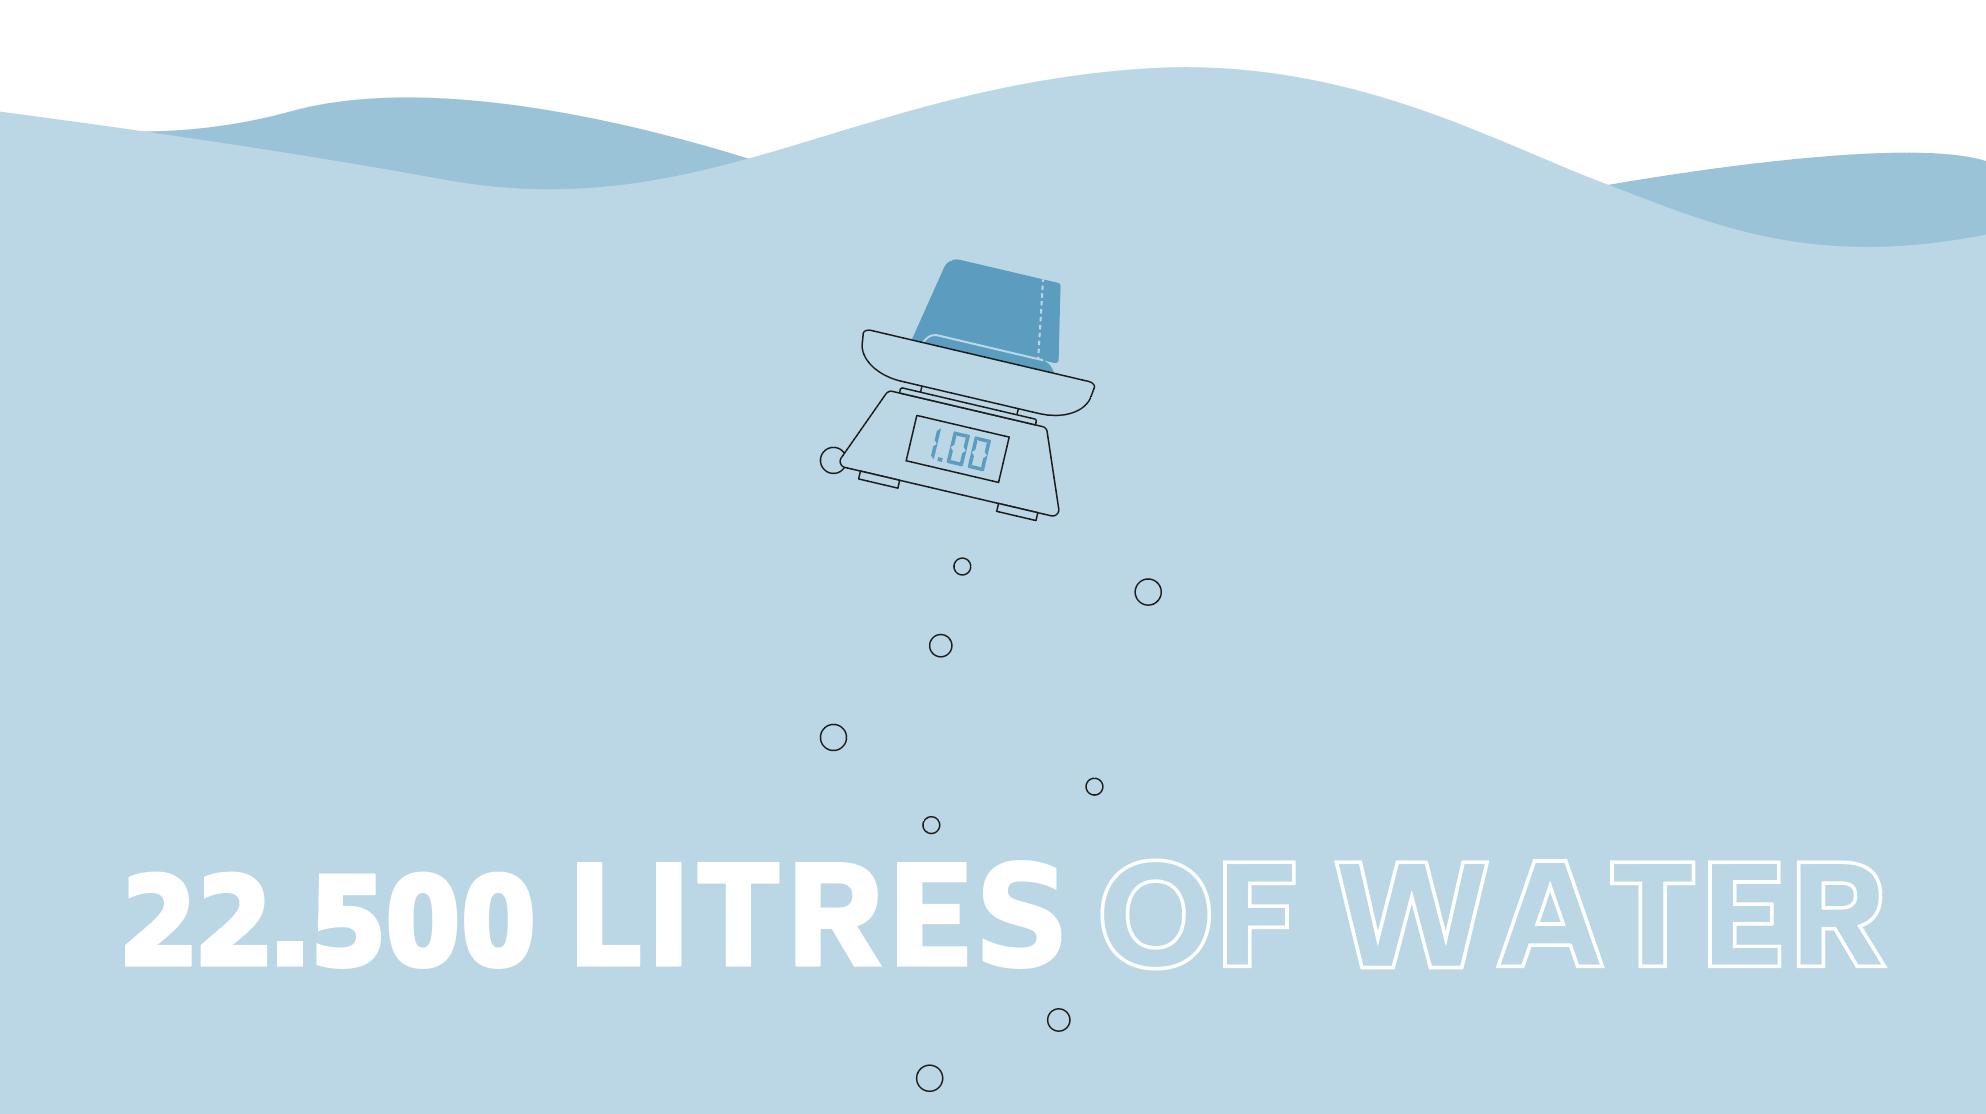 screenshot uit animatie water stewardship